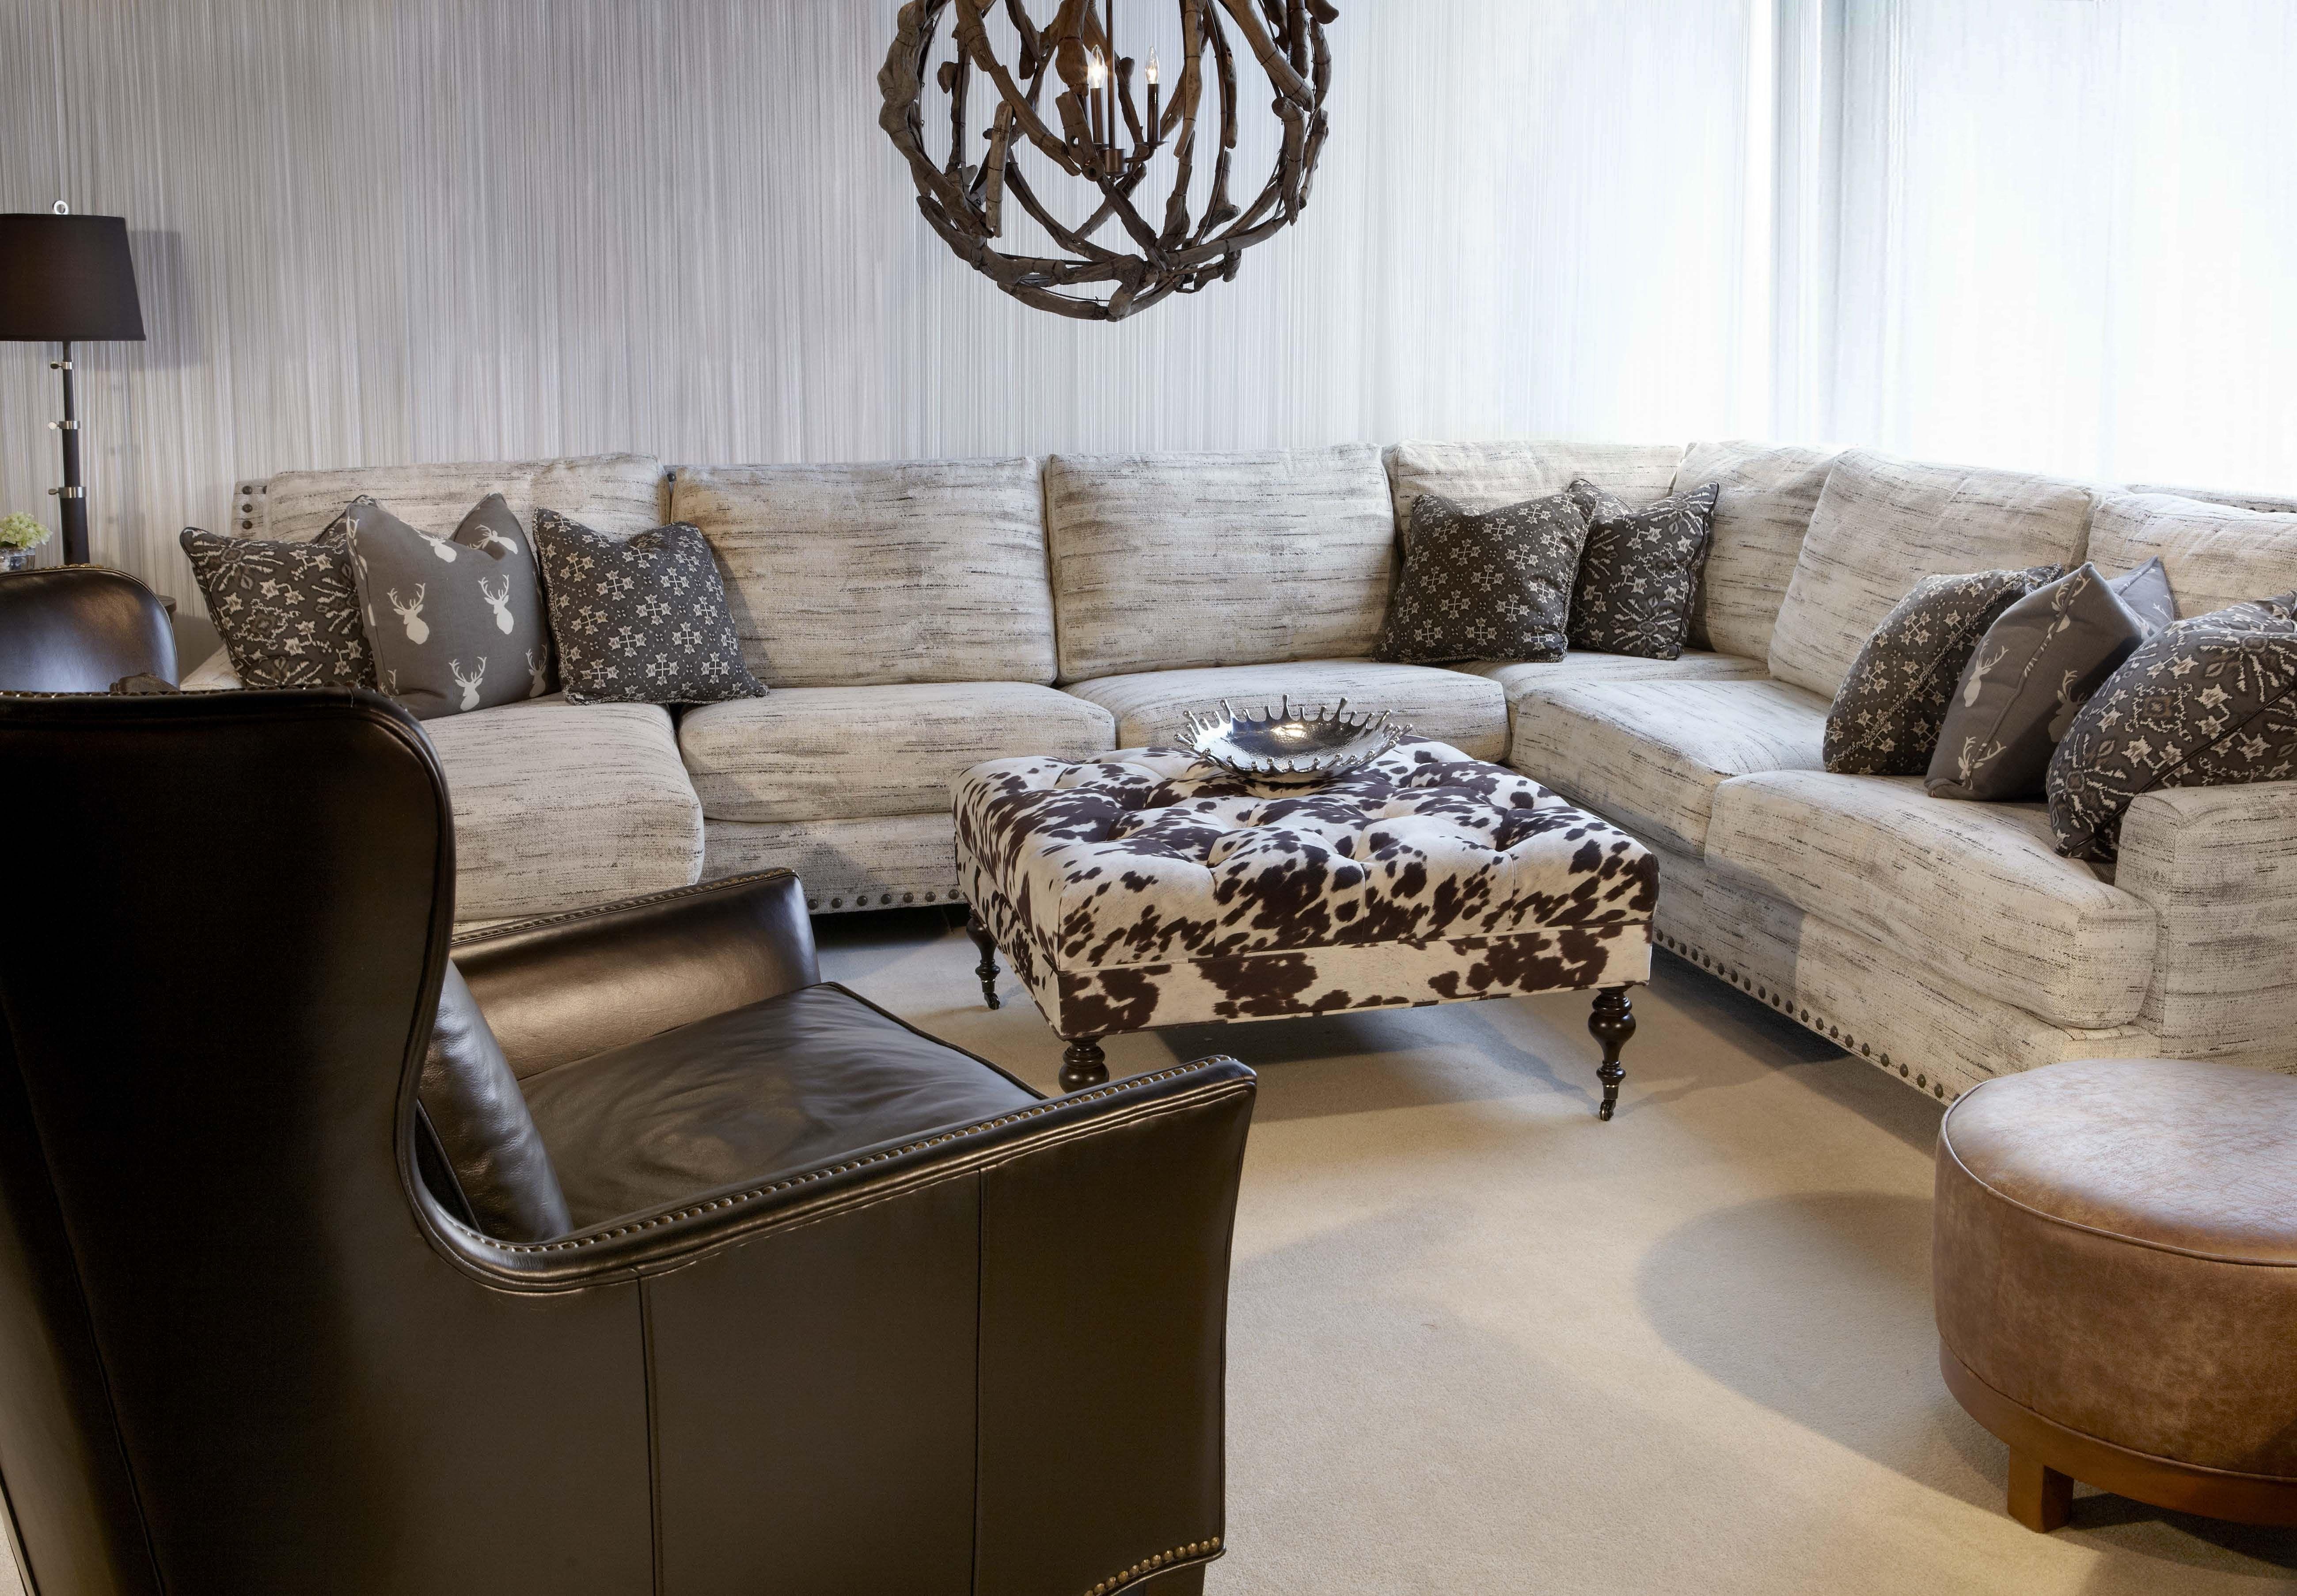 Linkin Sectionalnorwalk Furniture | Our Showroom! | Pinterest For Norwalk Sofas (Image 5 of 10)